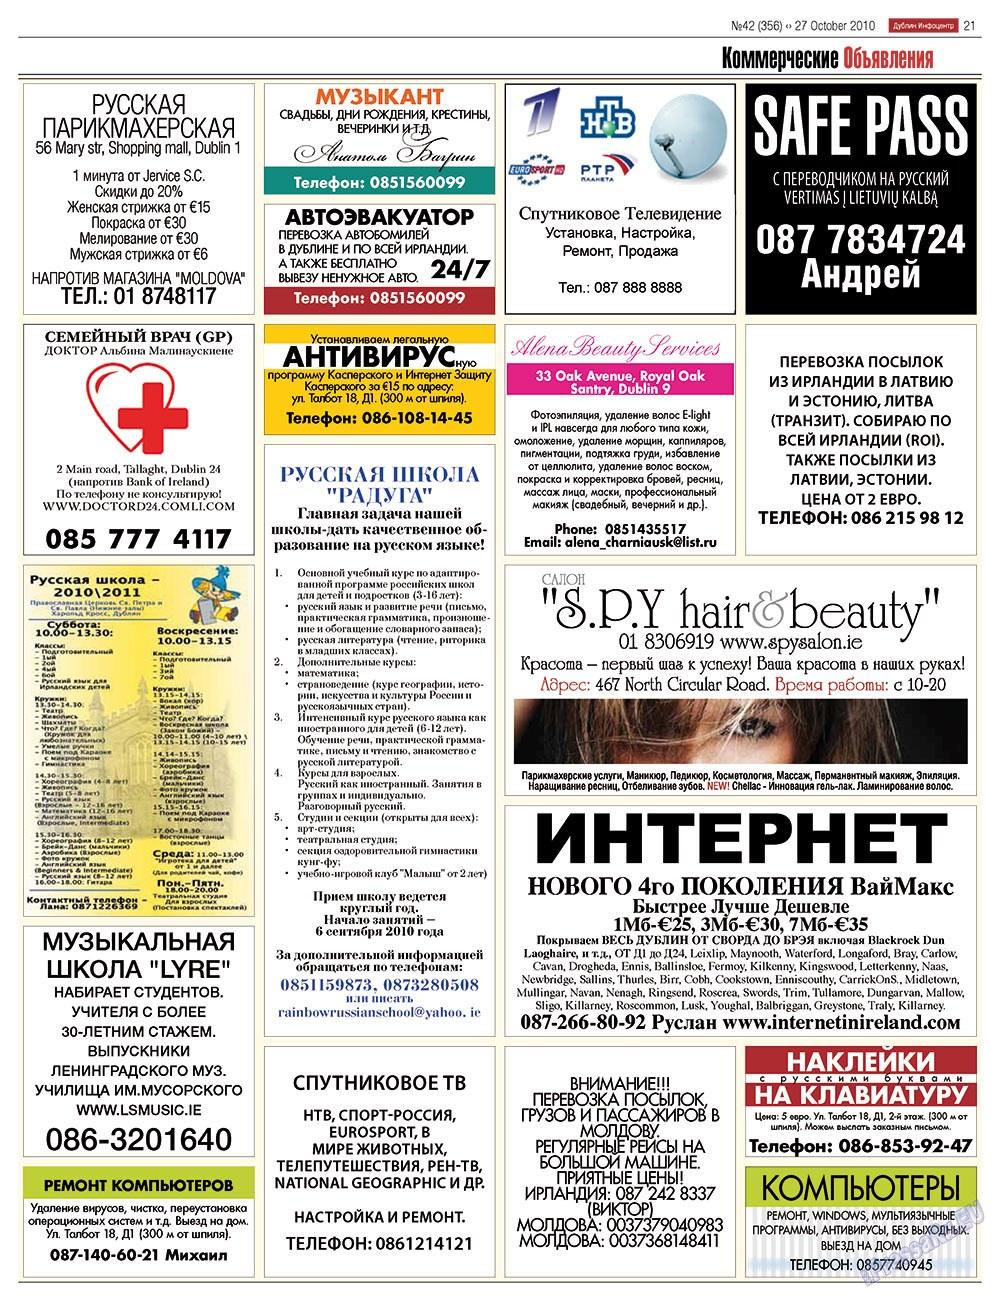 Дублин инфоцентр (газета). 2010 год, номер 42, стр. 21